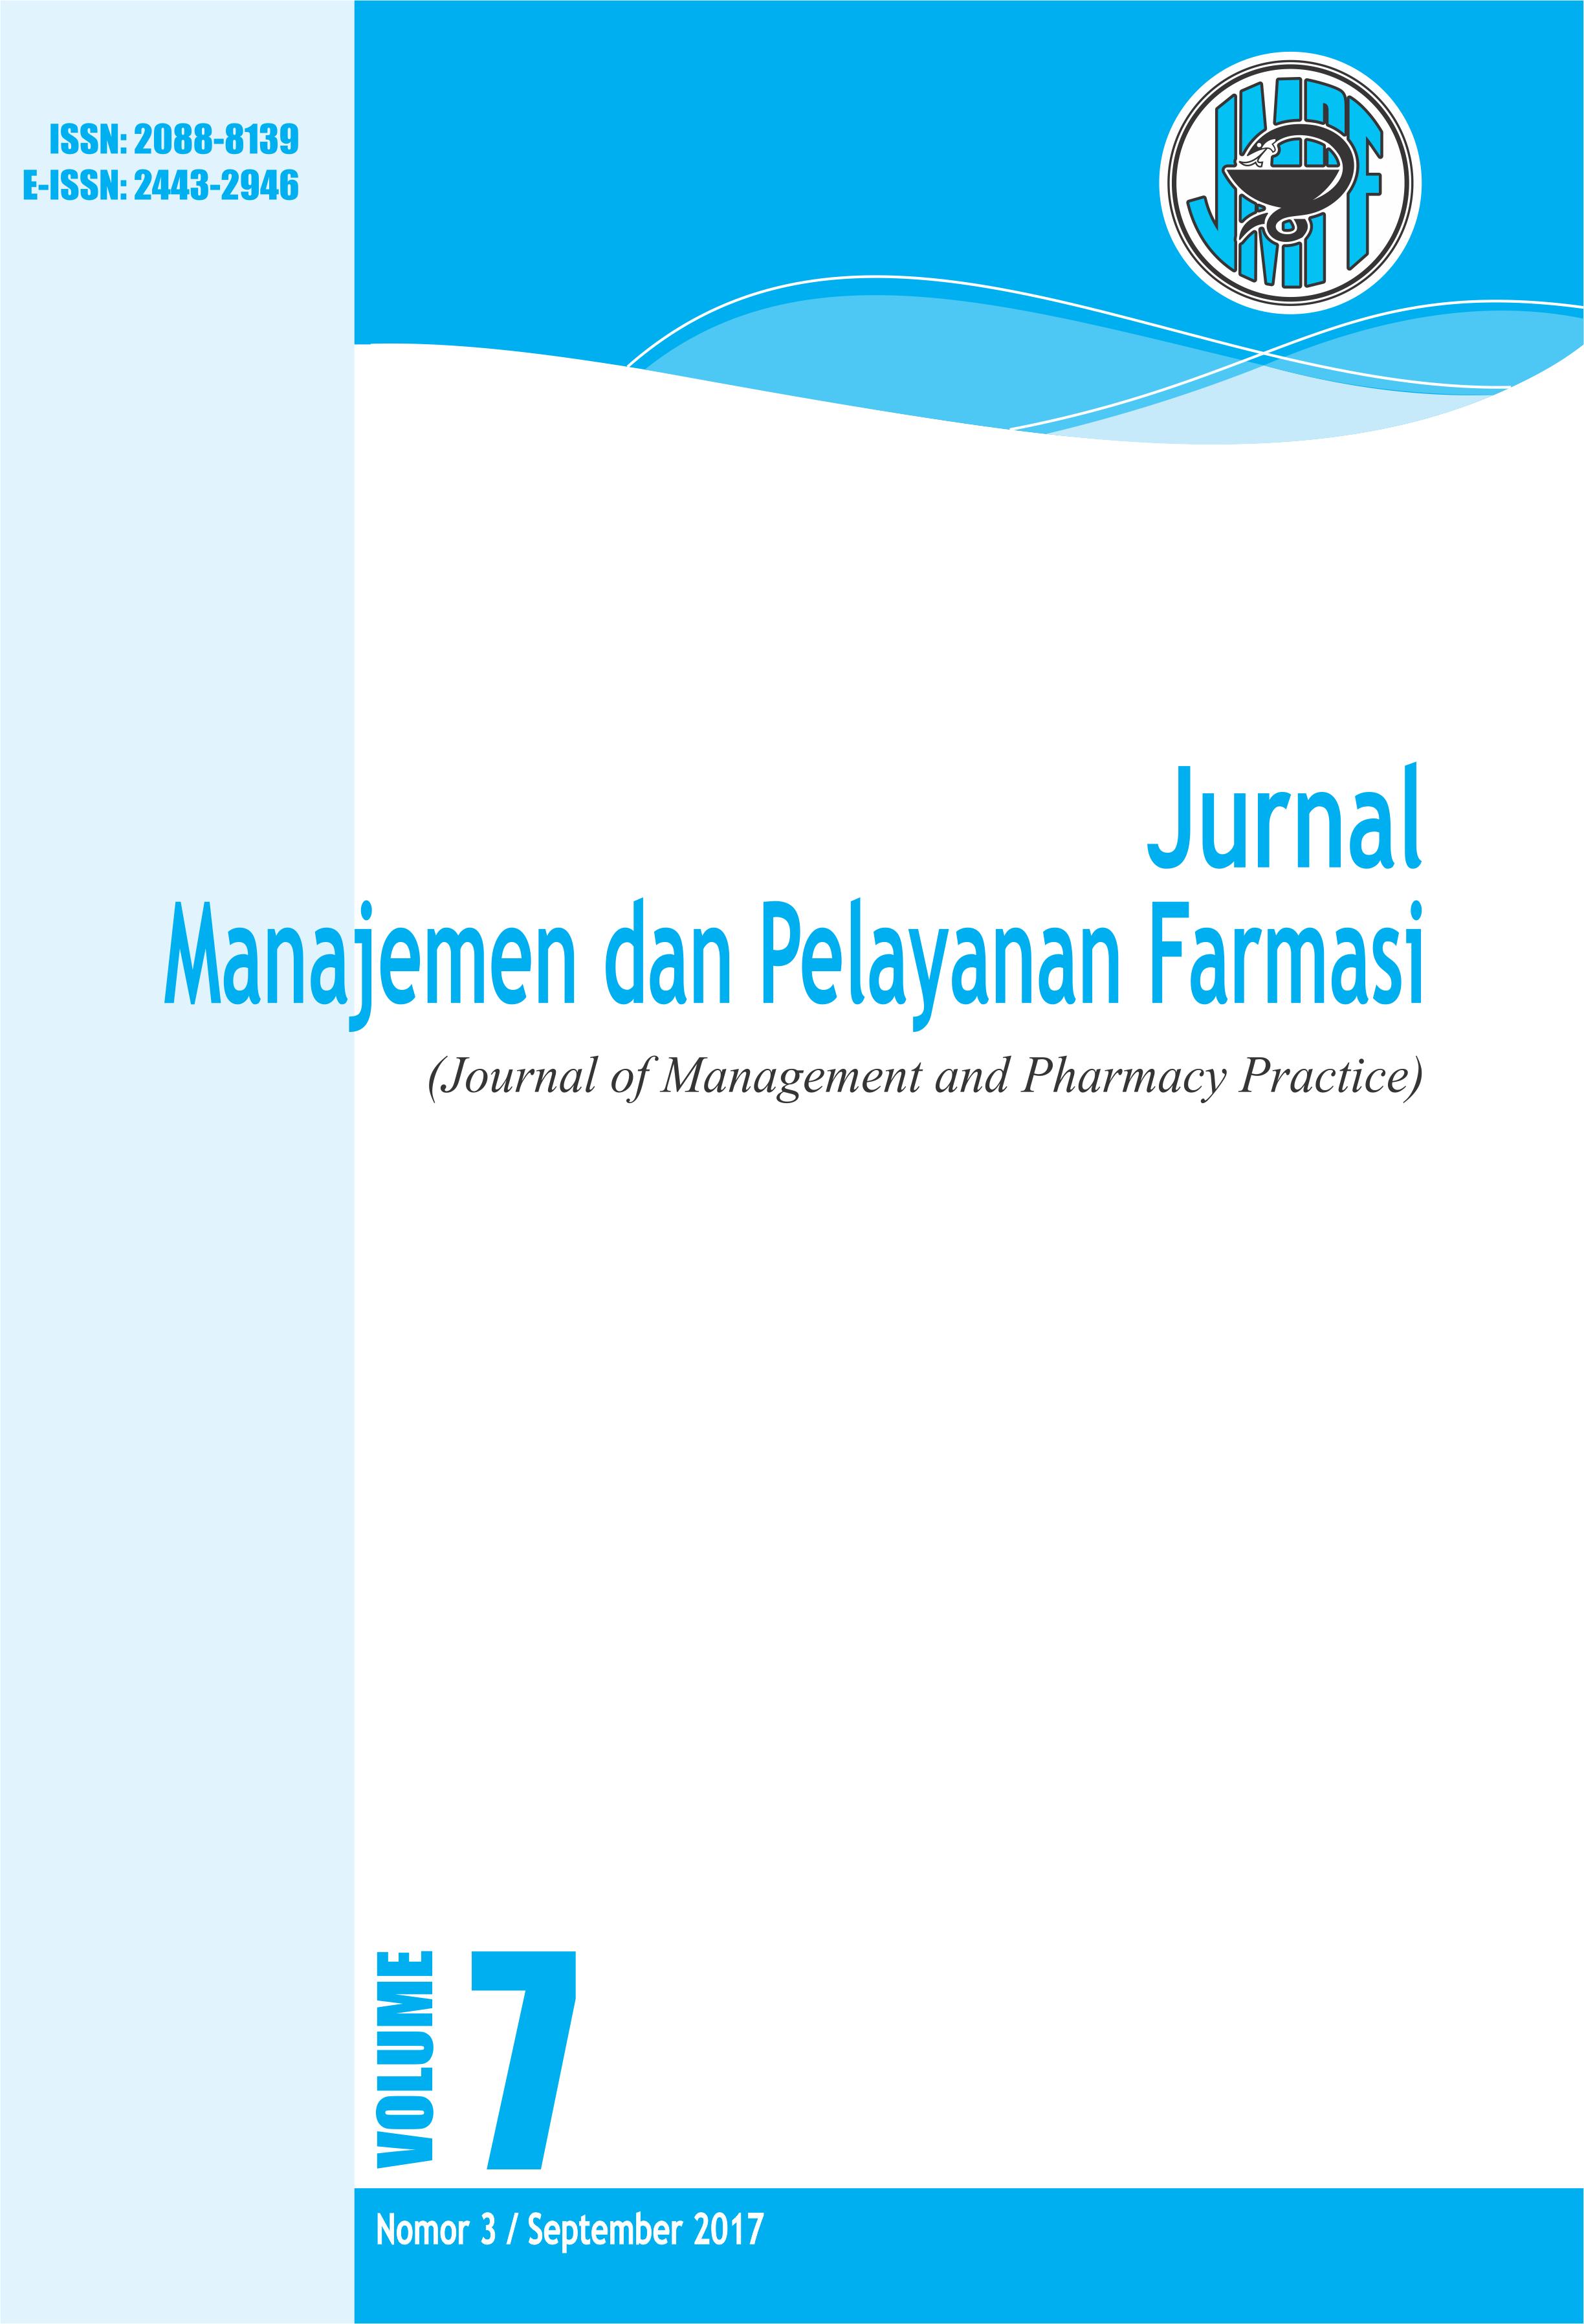 JMPF-UGM